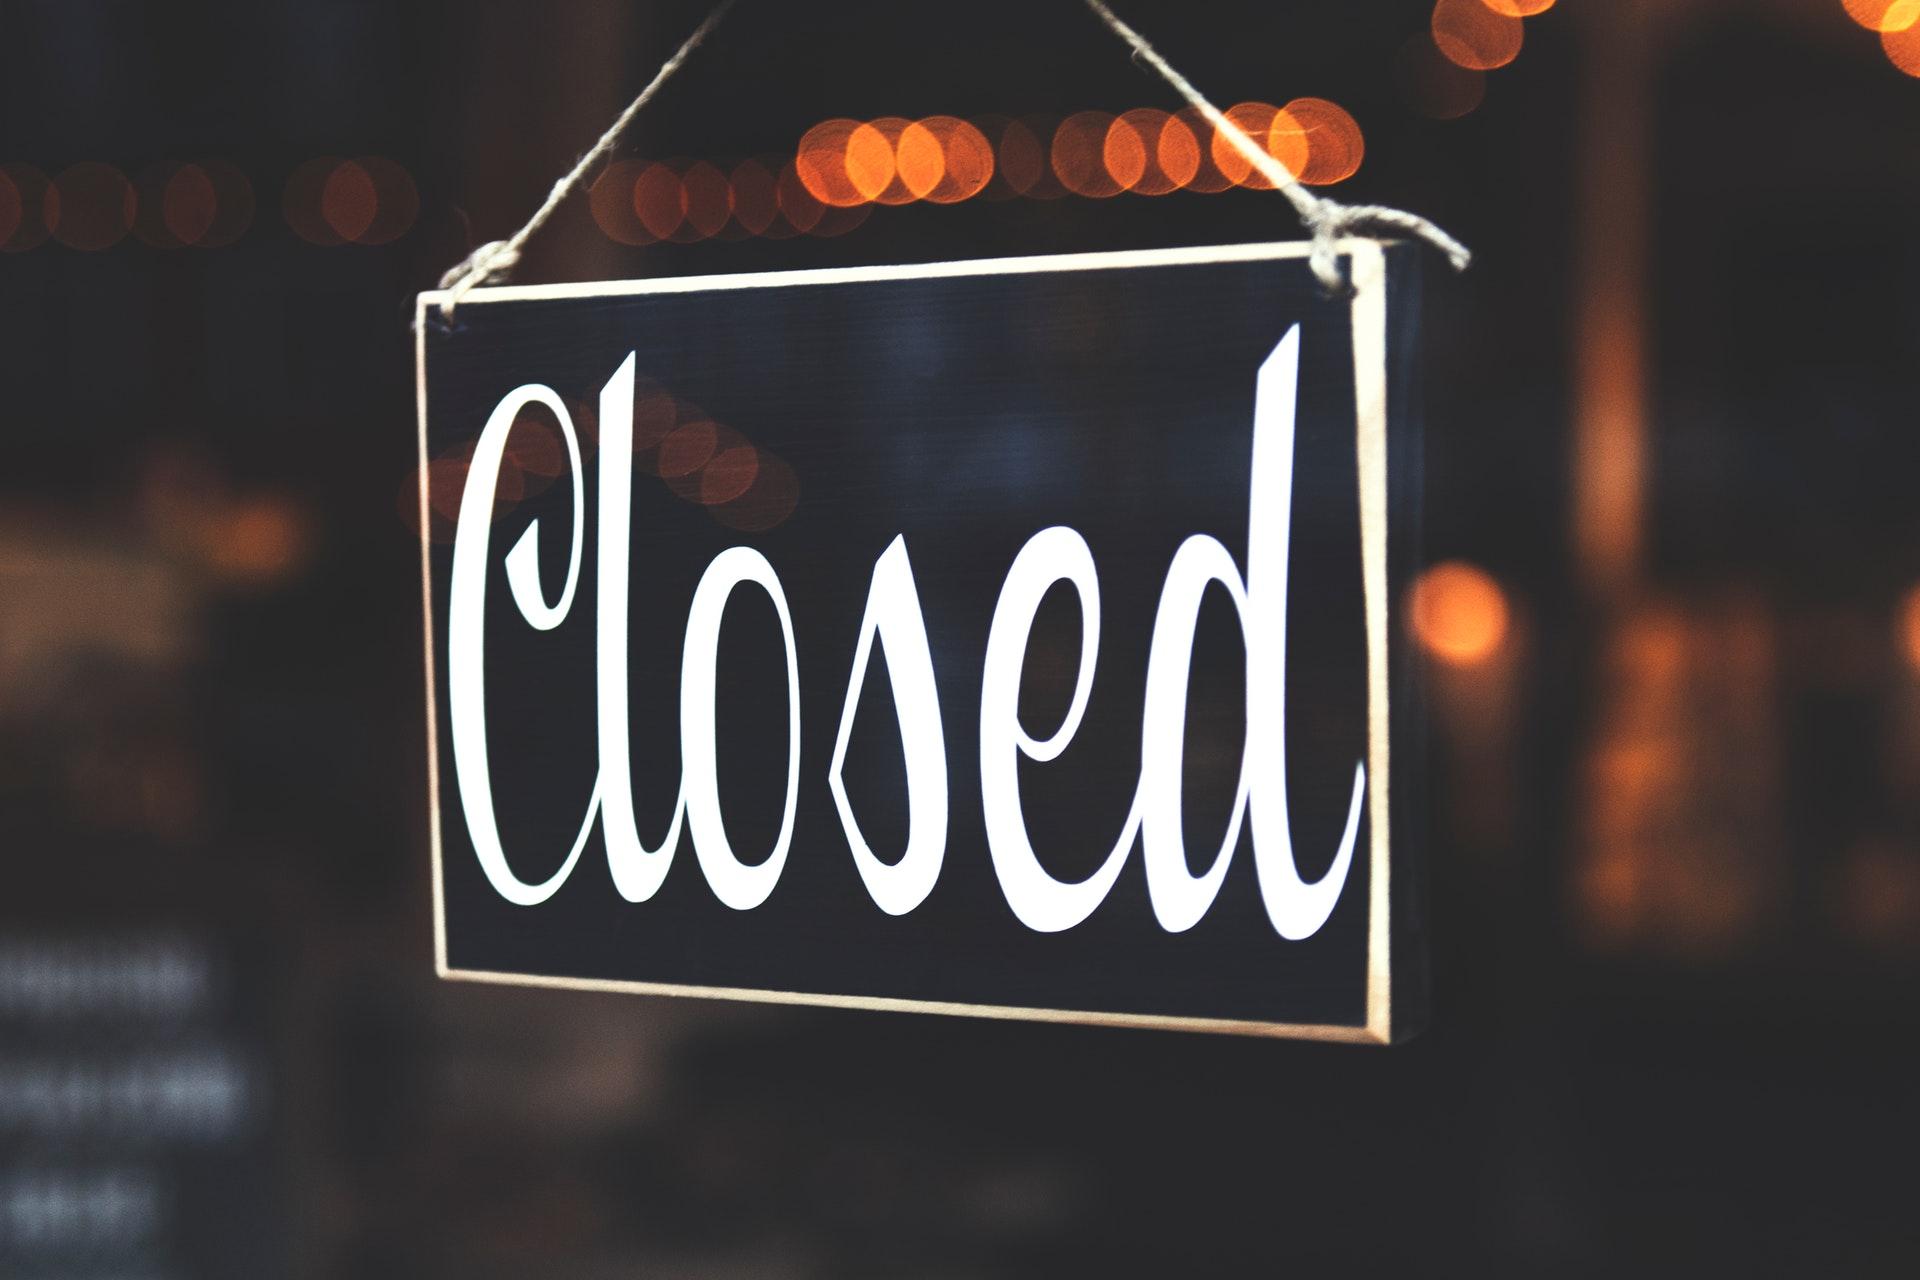 luk, lukket, restaurant, jamie oliver, konkurs, closed